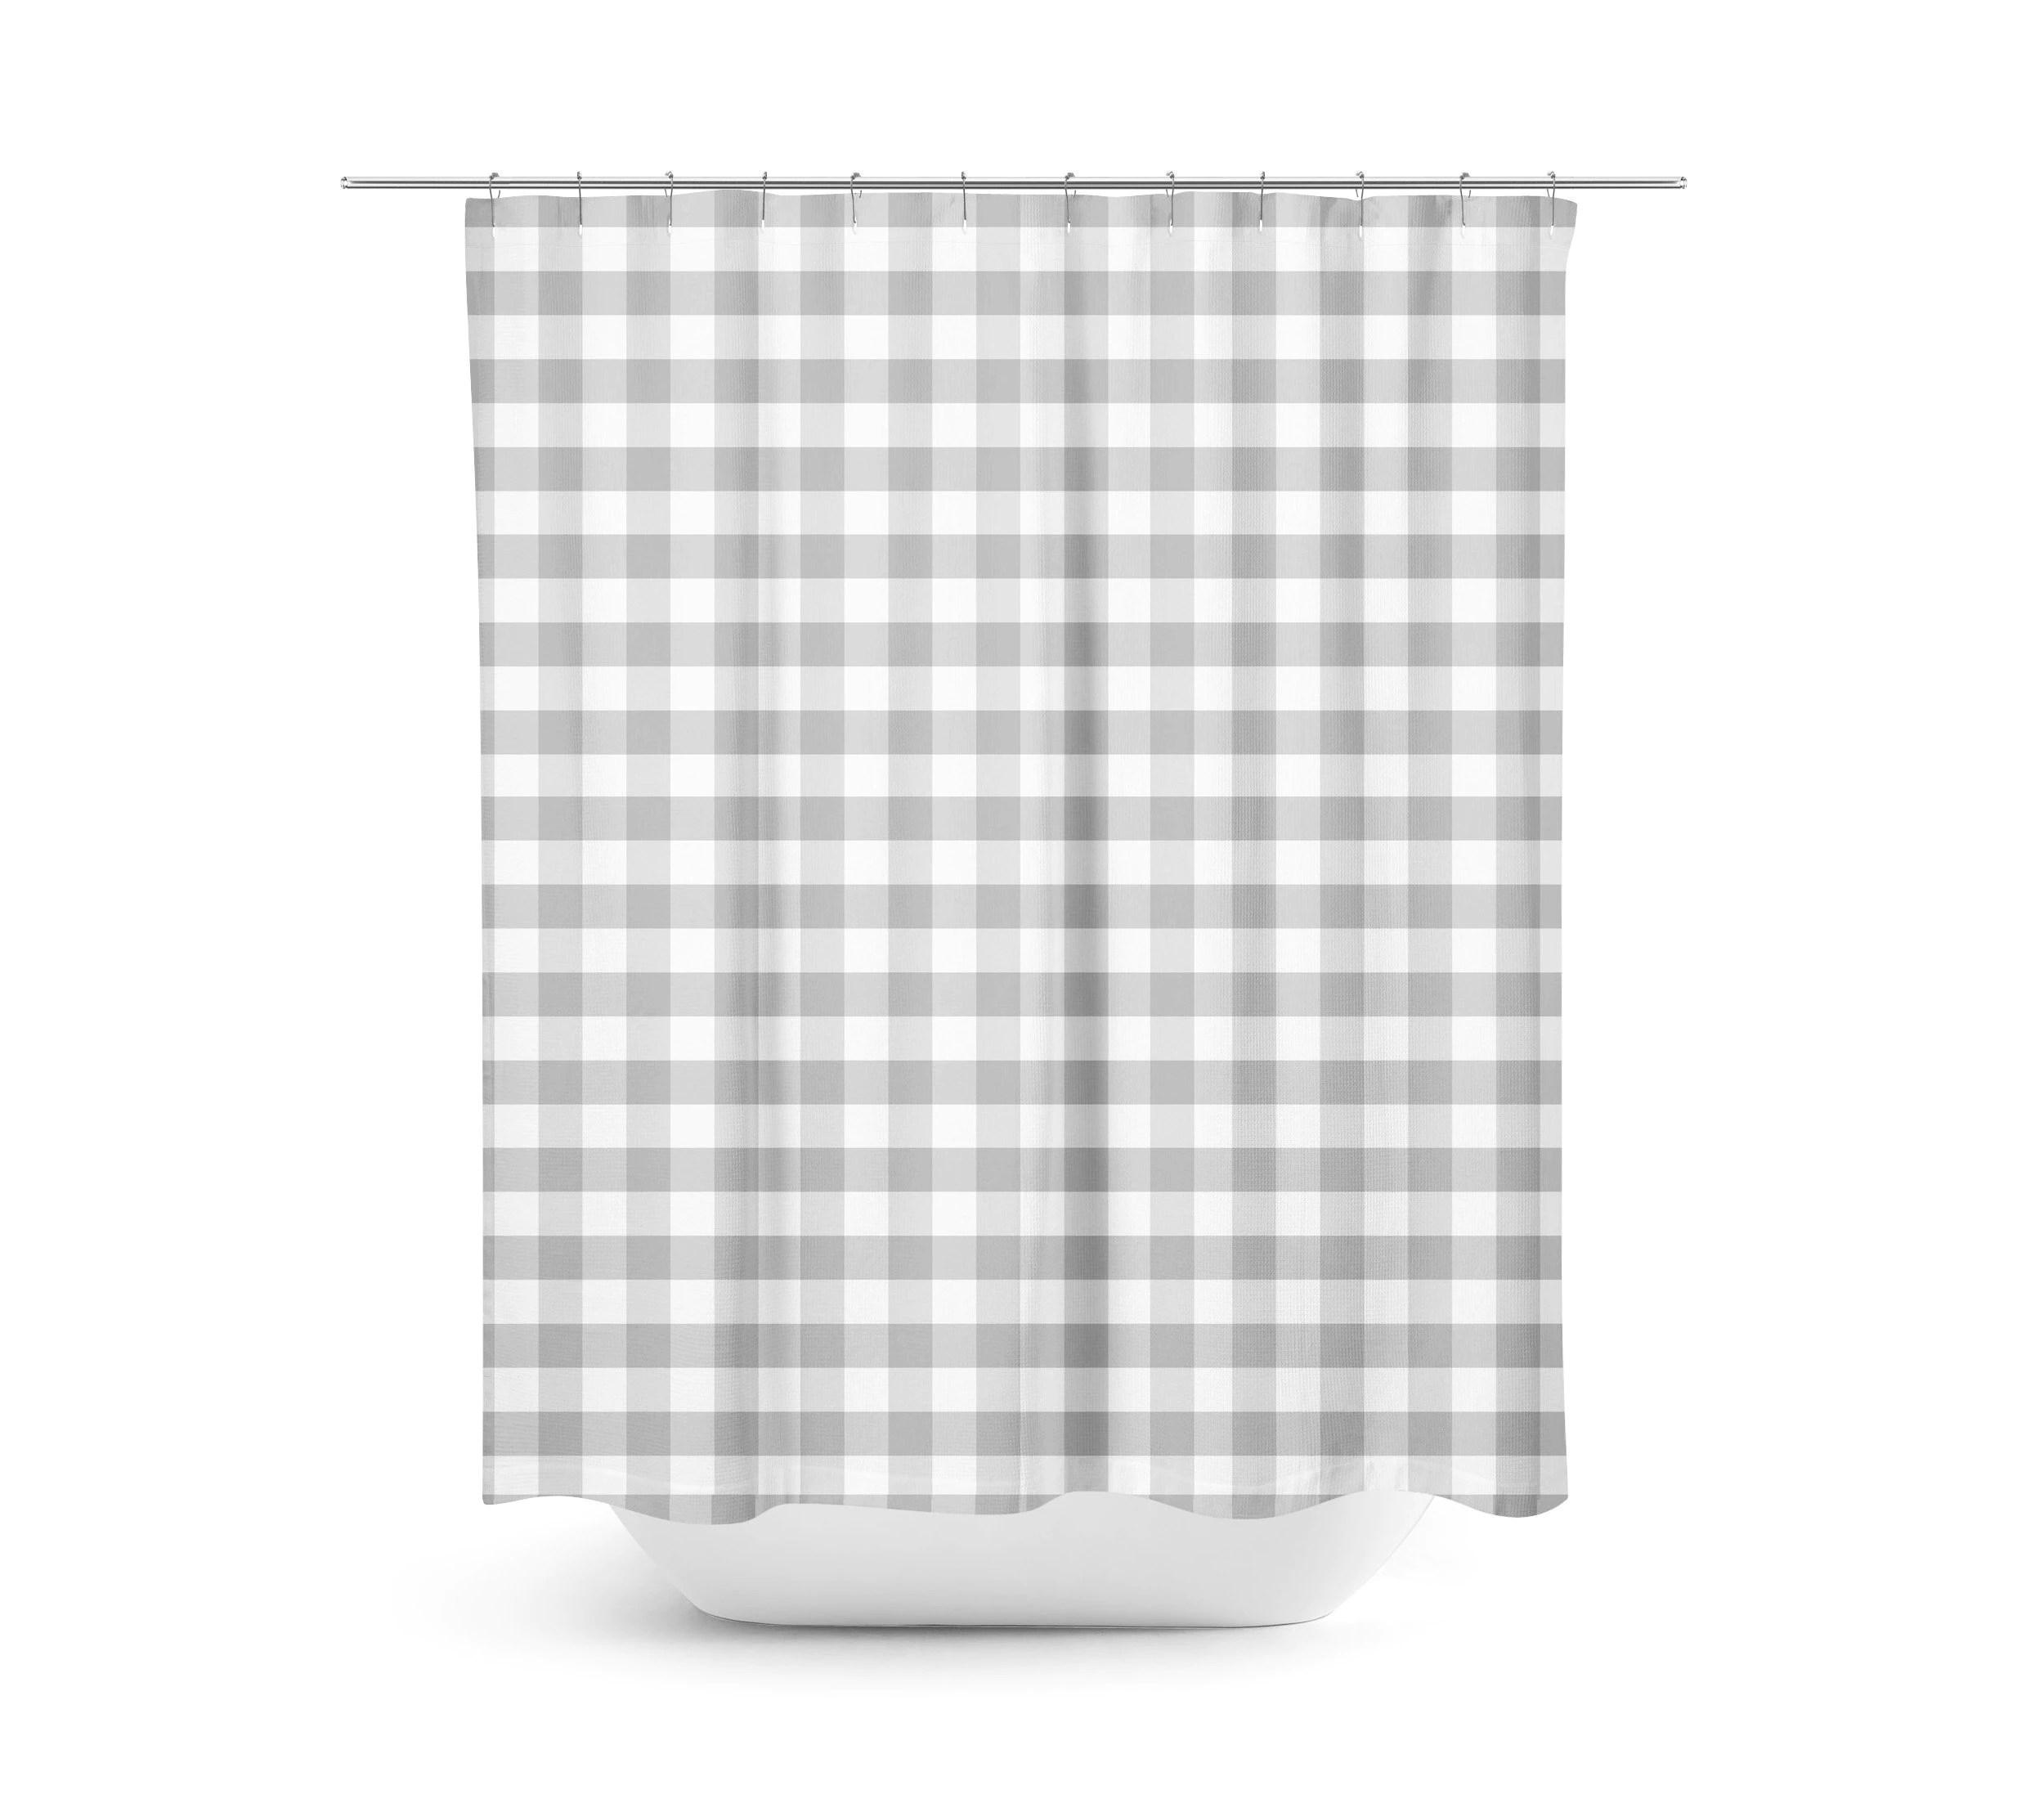 Gray Gingham Shower Curtain Farmhouse Bathroom Decor Gray Shower Curtain Country Decor Fabric Shower Curtain Plaid Gray And White